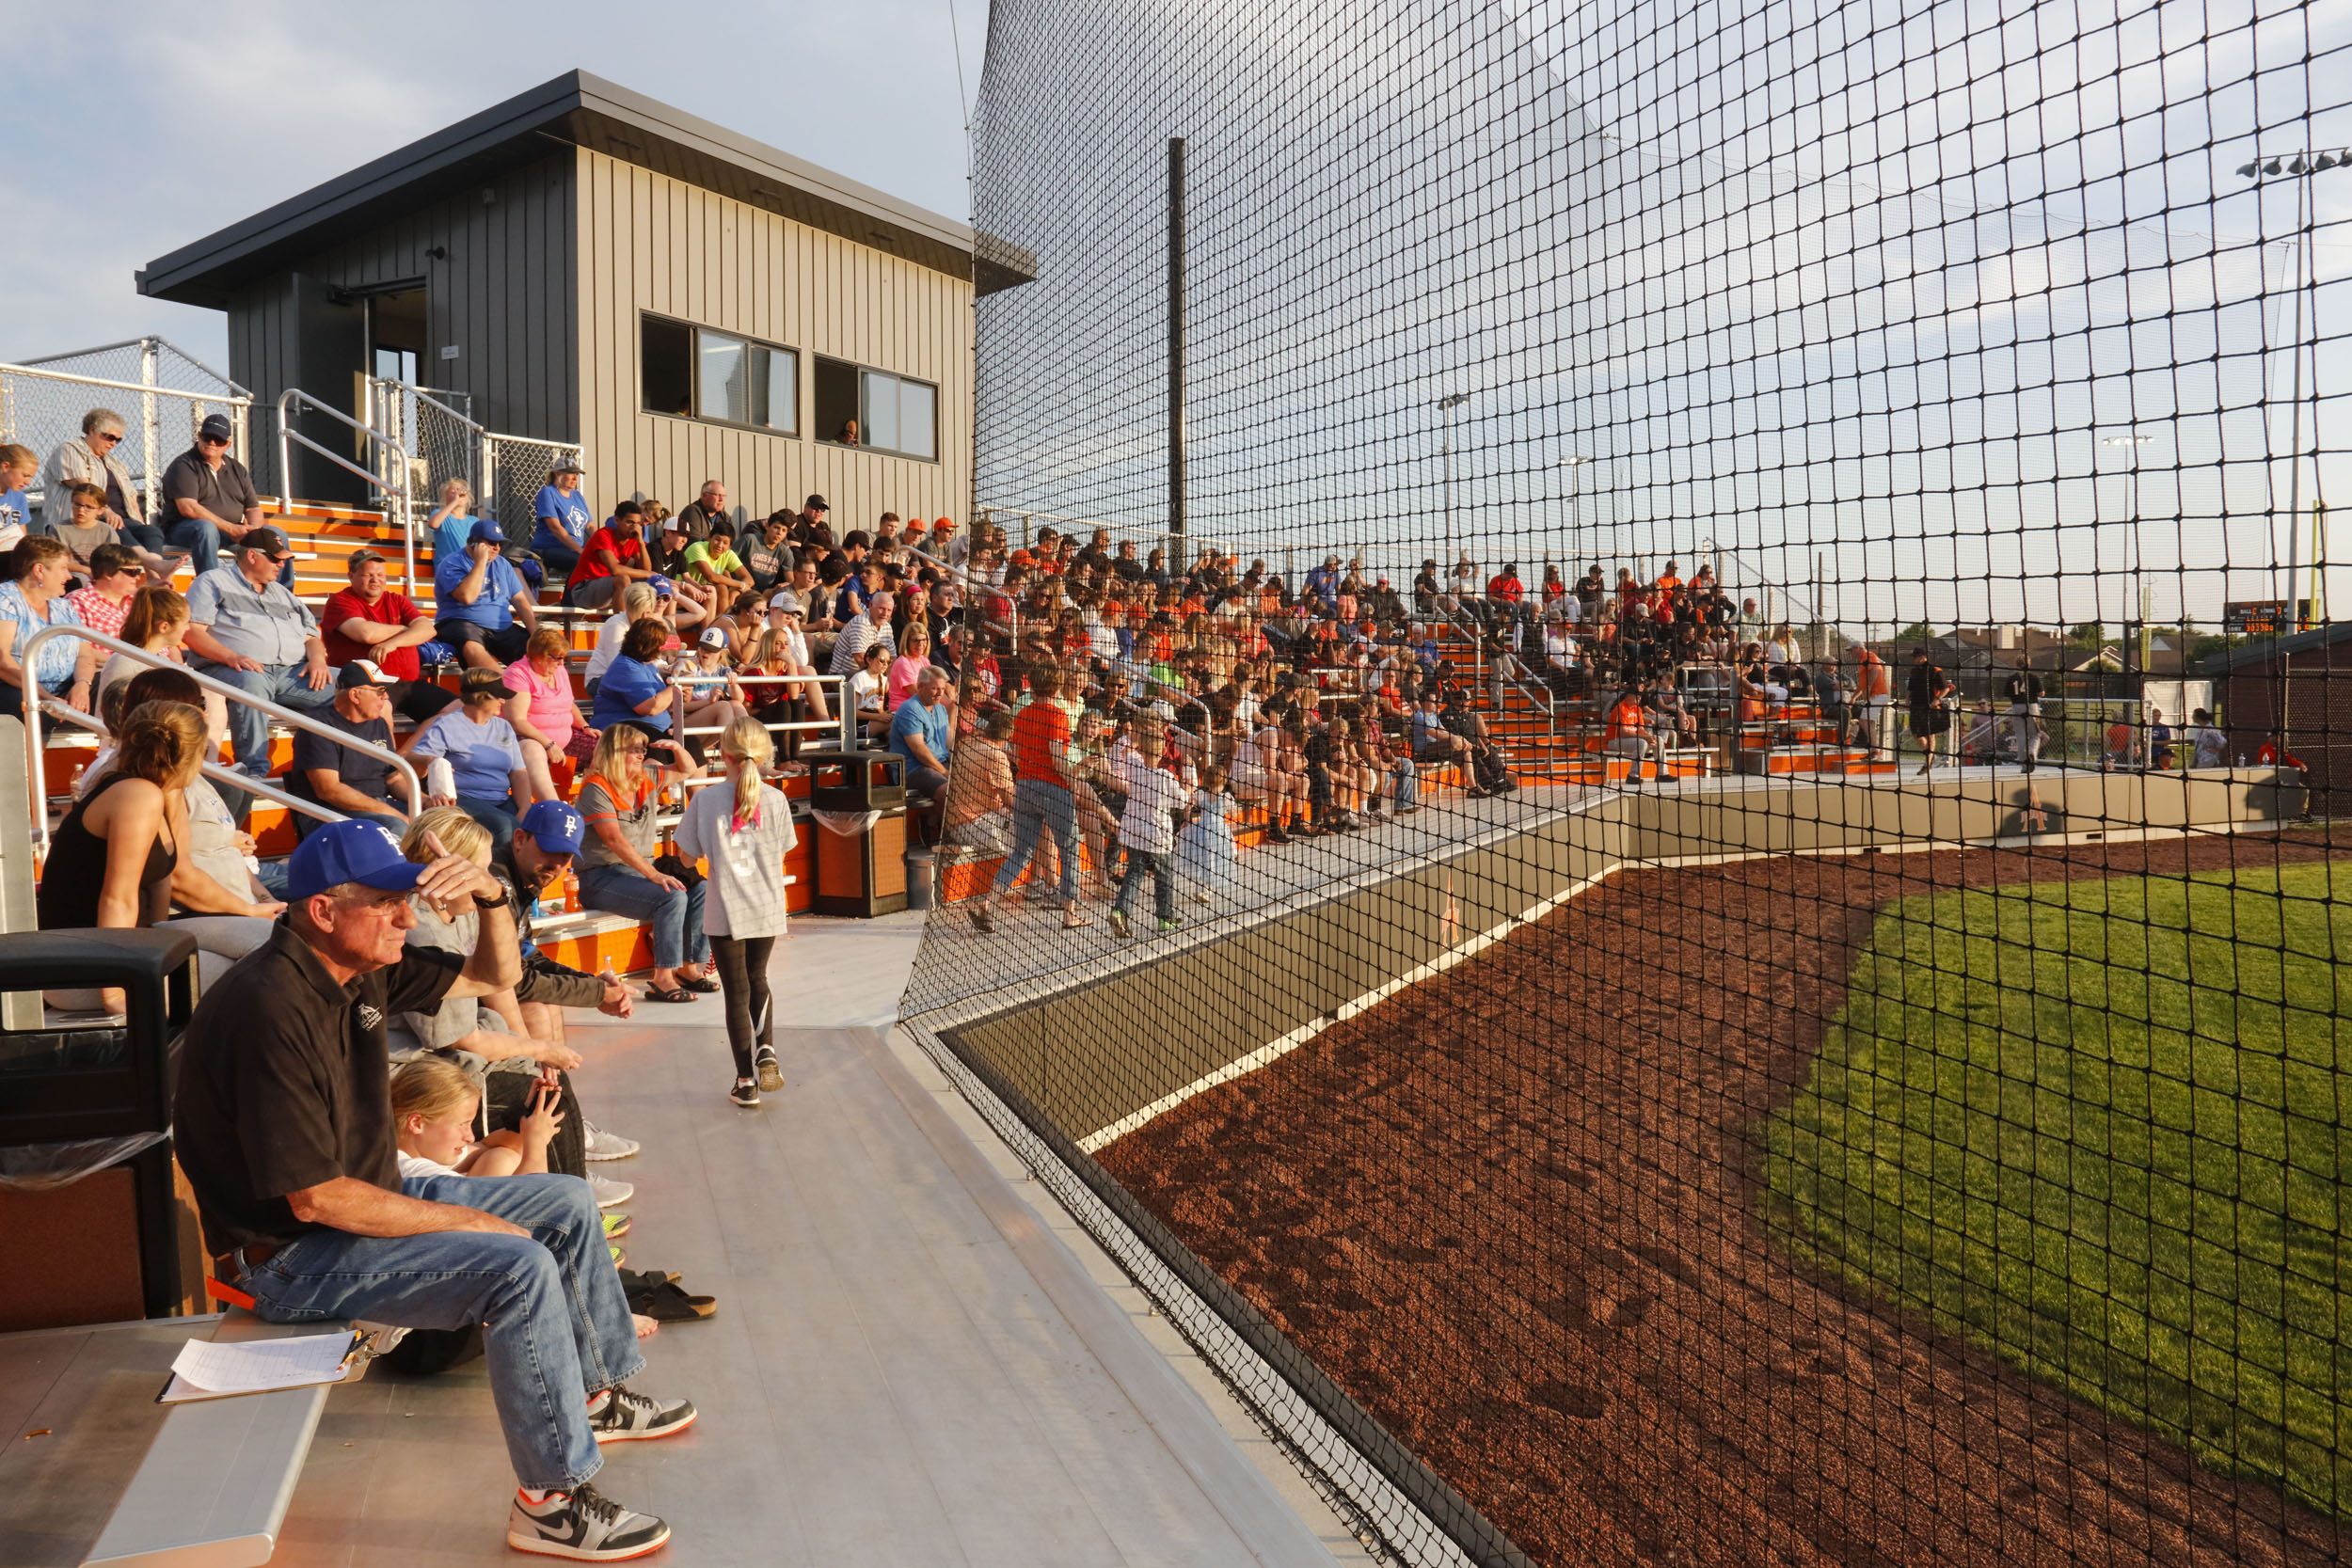 303-Ames-Baseball-Softball-Complex